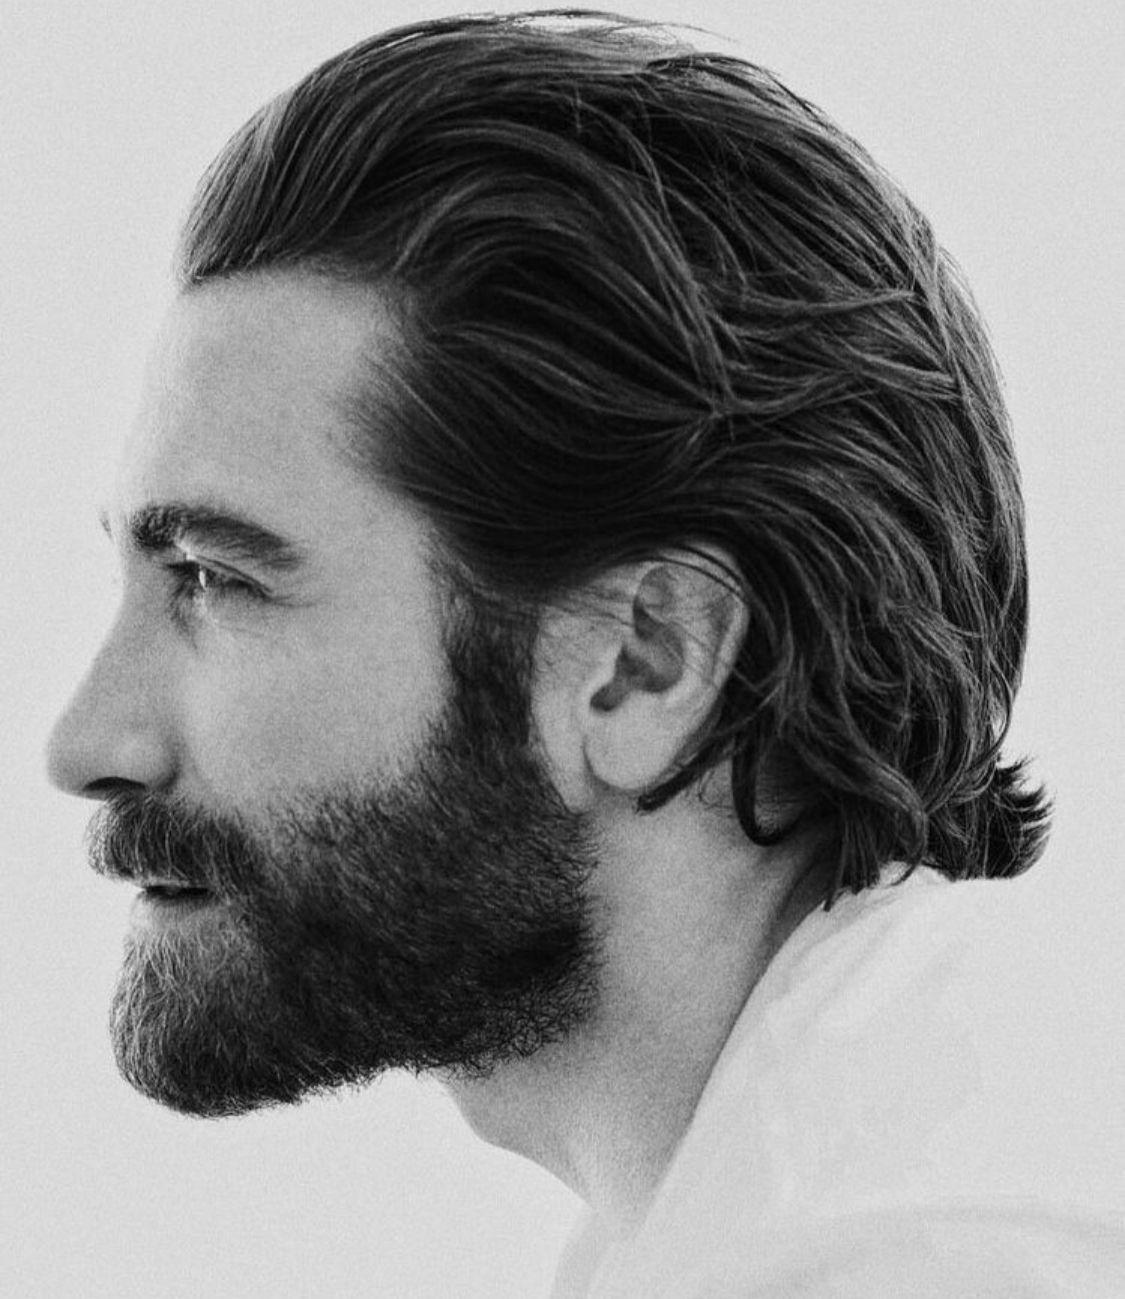 10+ Medium length hairstyles for men ideas